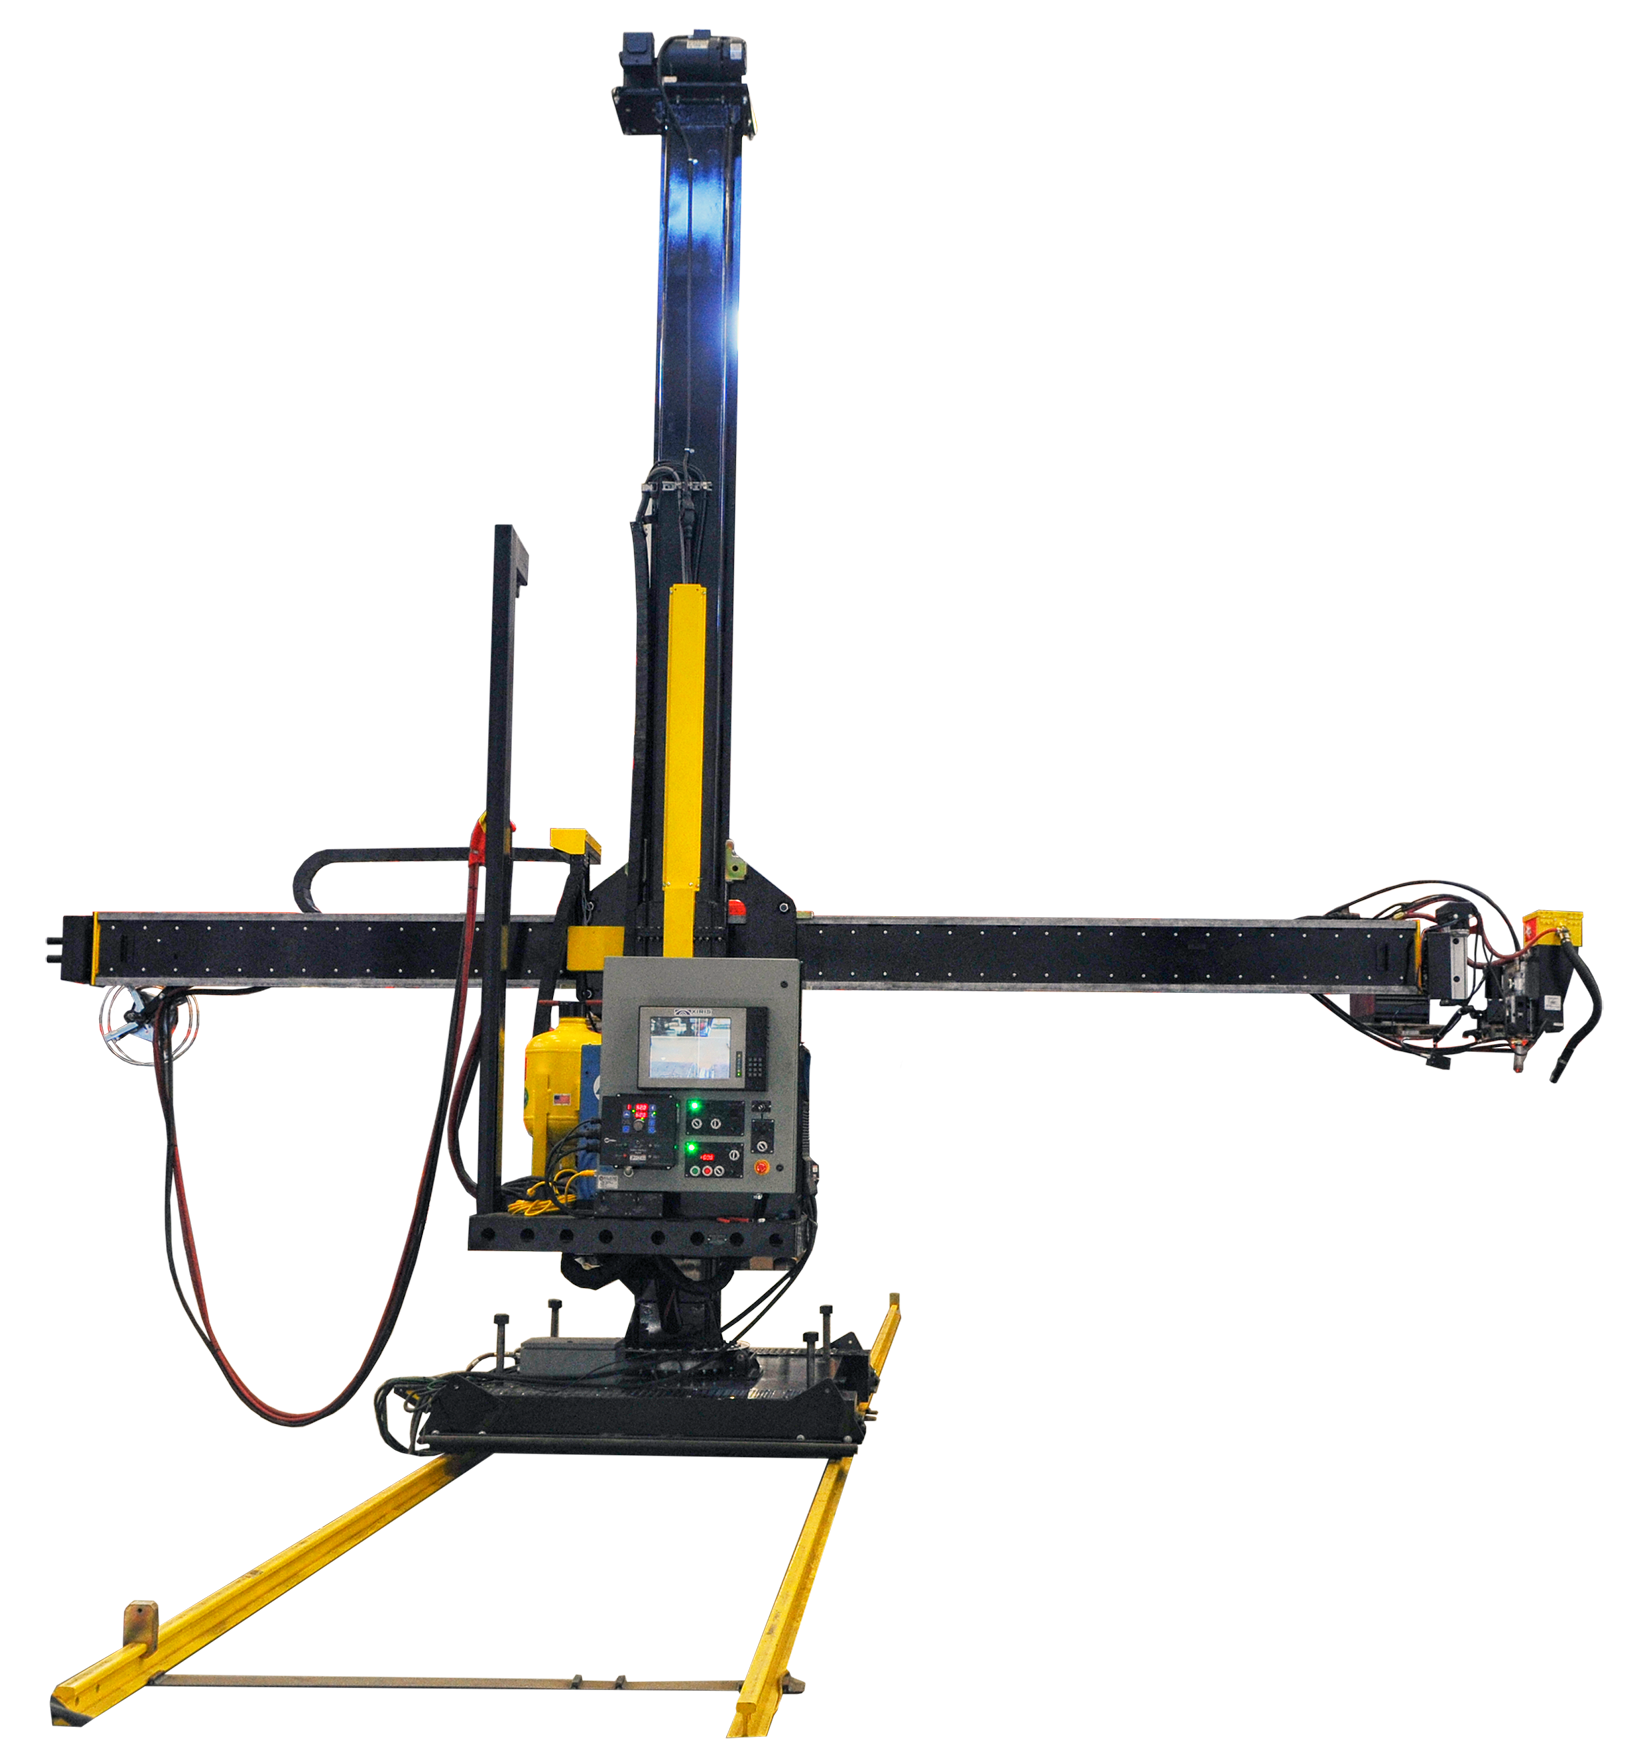 mn16_welding_manipulator.png